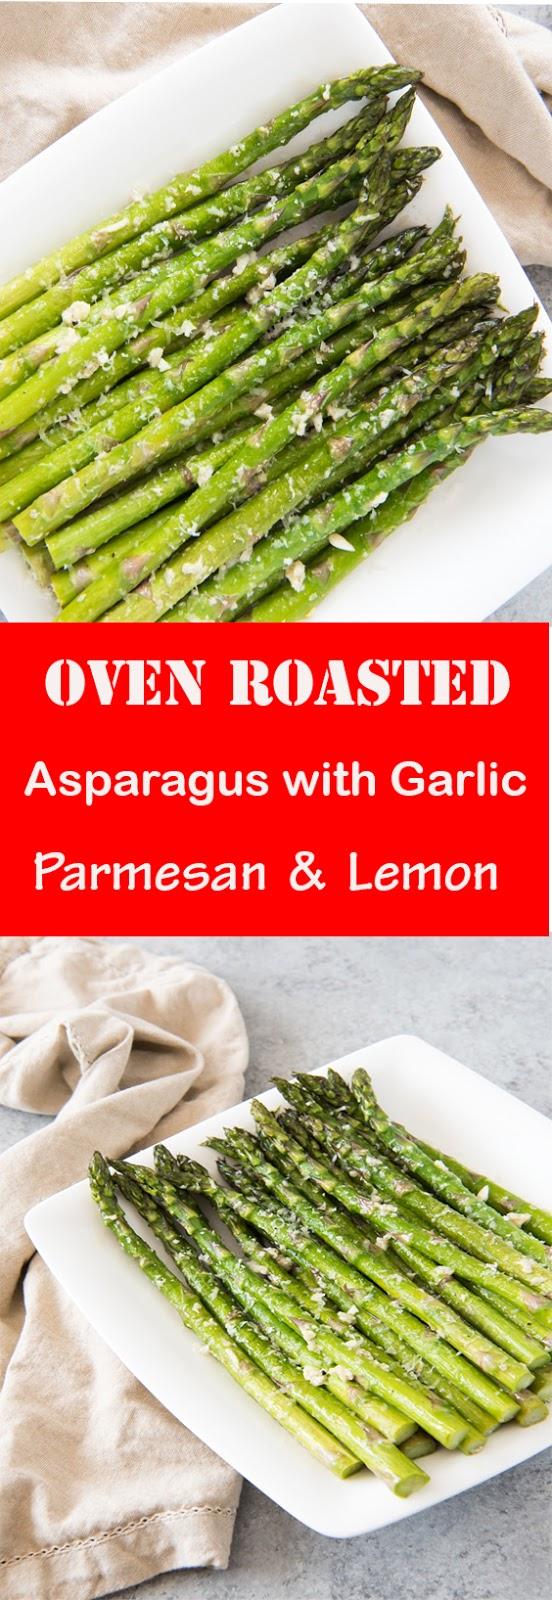 Oven Roasted Asparagus with Garlic, Parmesan & Lemon